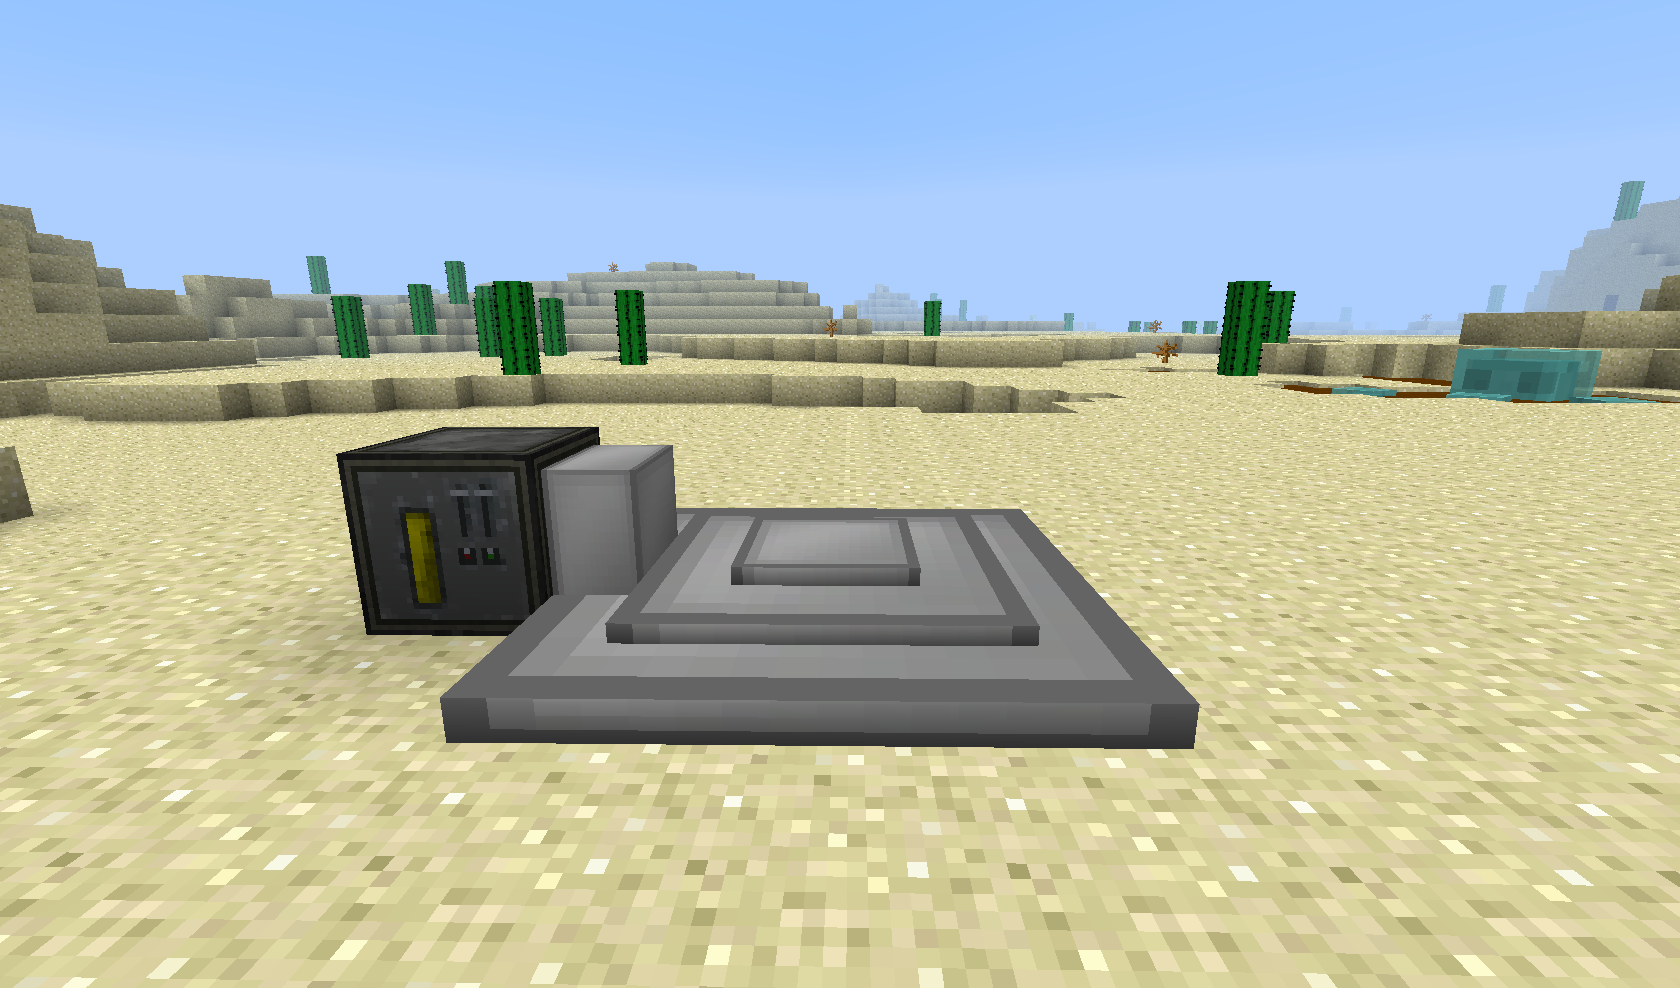 Fuel Loader Minecraft Big Dig Pack Wiki Fandom Powered By Wikia